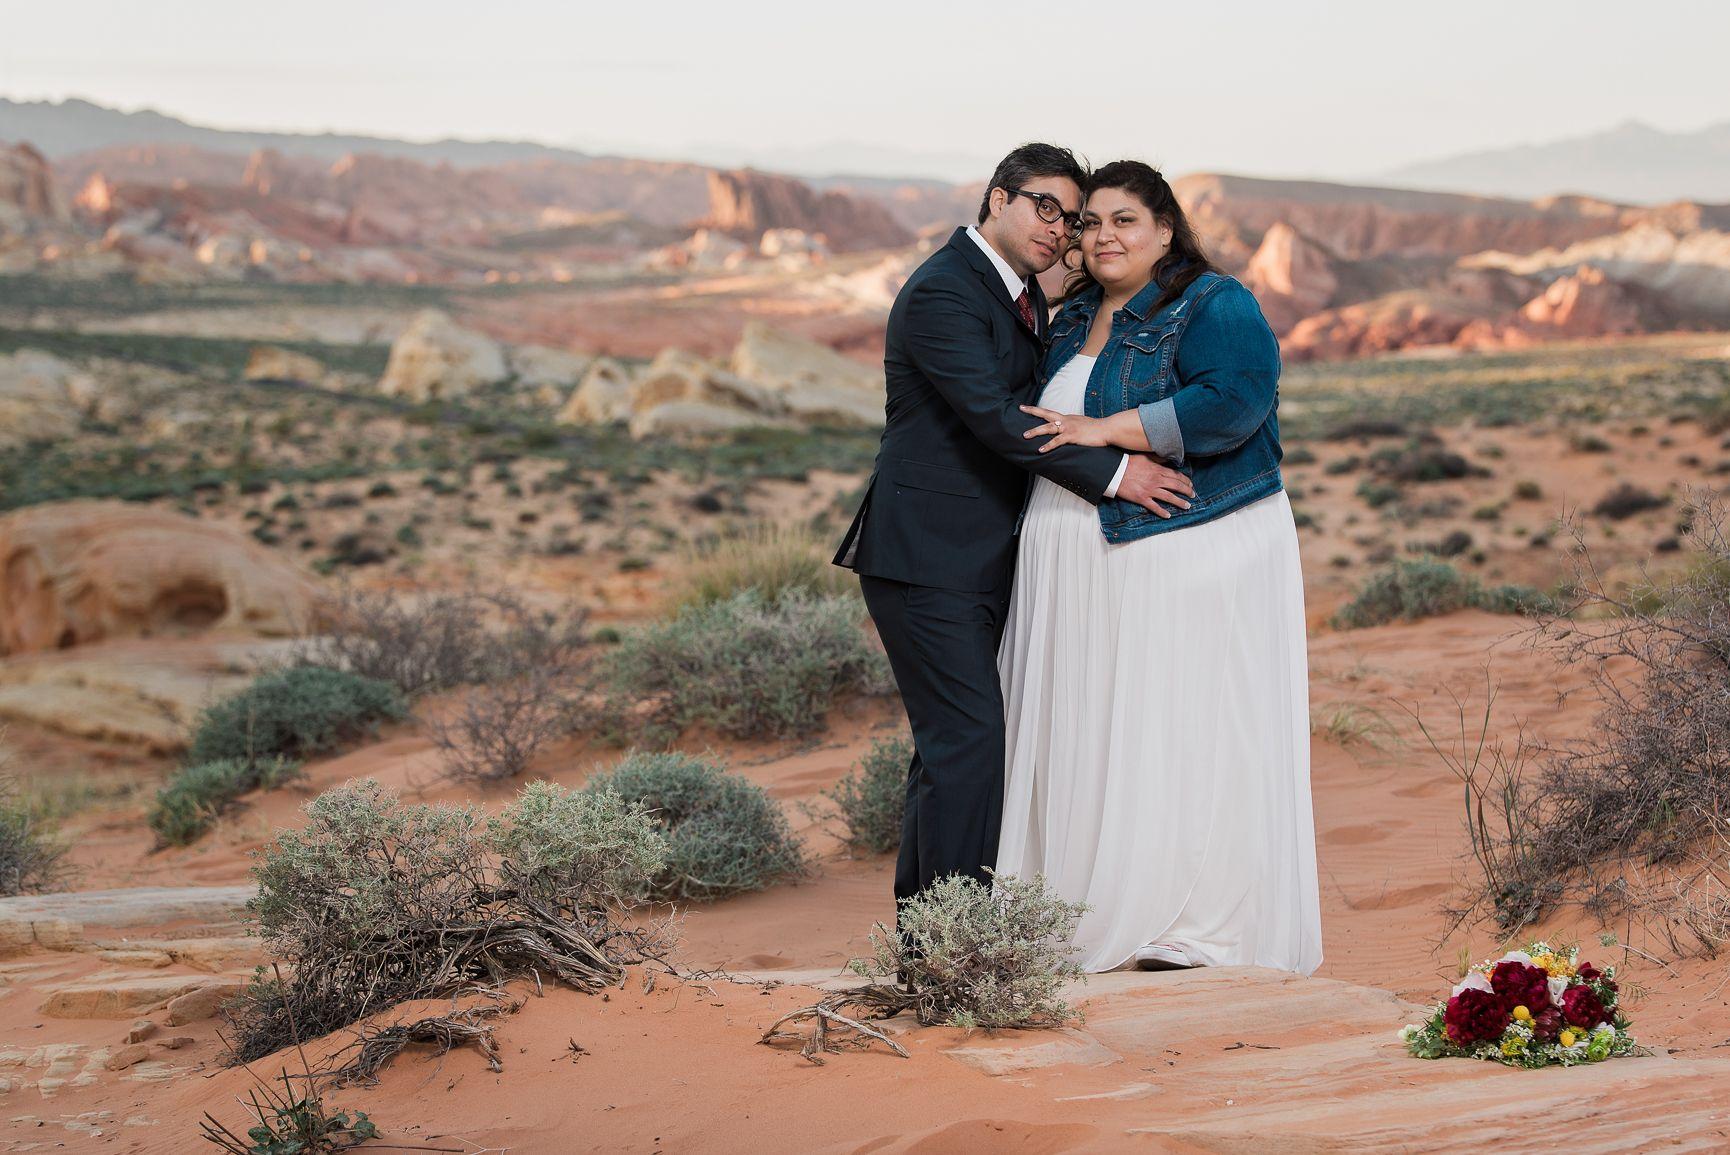 Rainbow Vista is always beautiful for weddings #valleyoffirewedding #lasvegasweddingphotographer #desertwedding